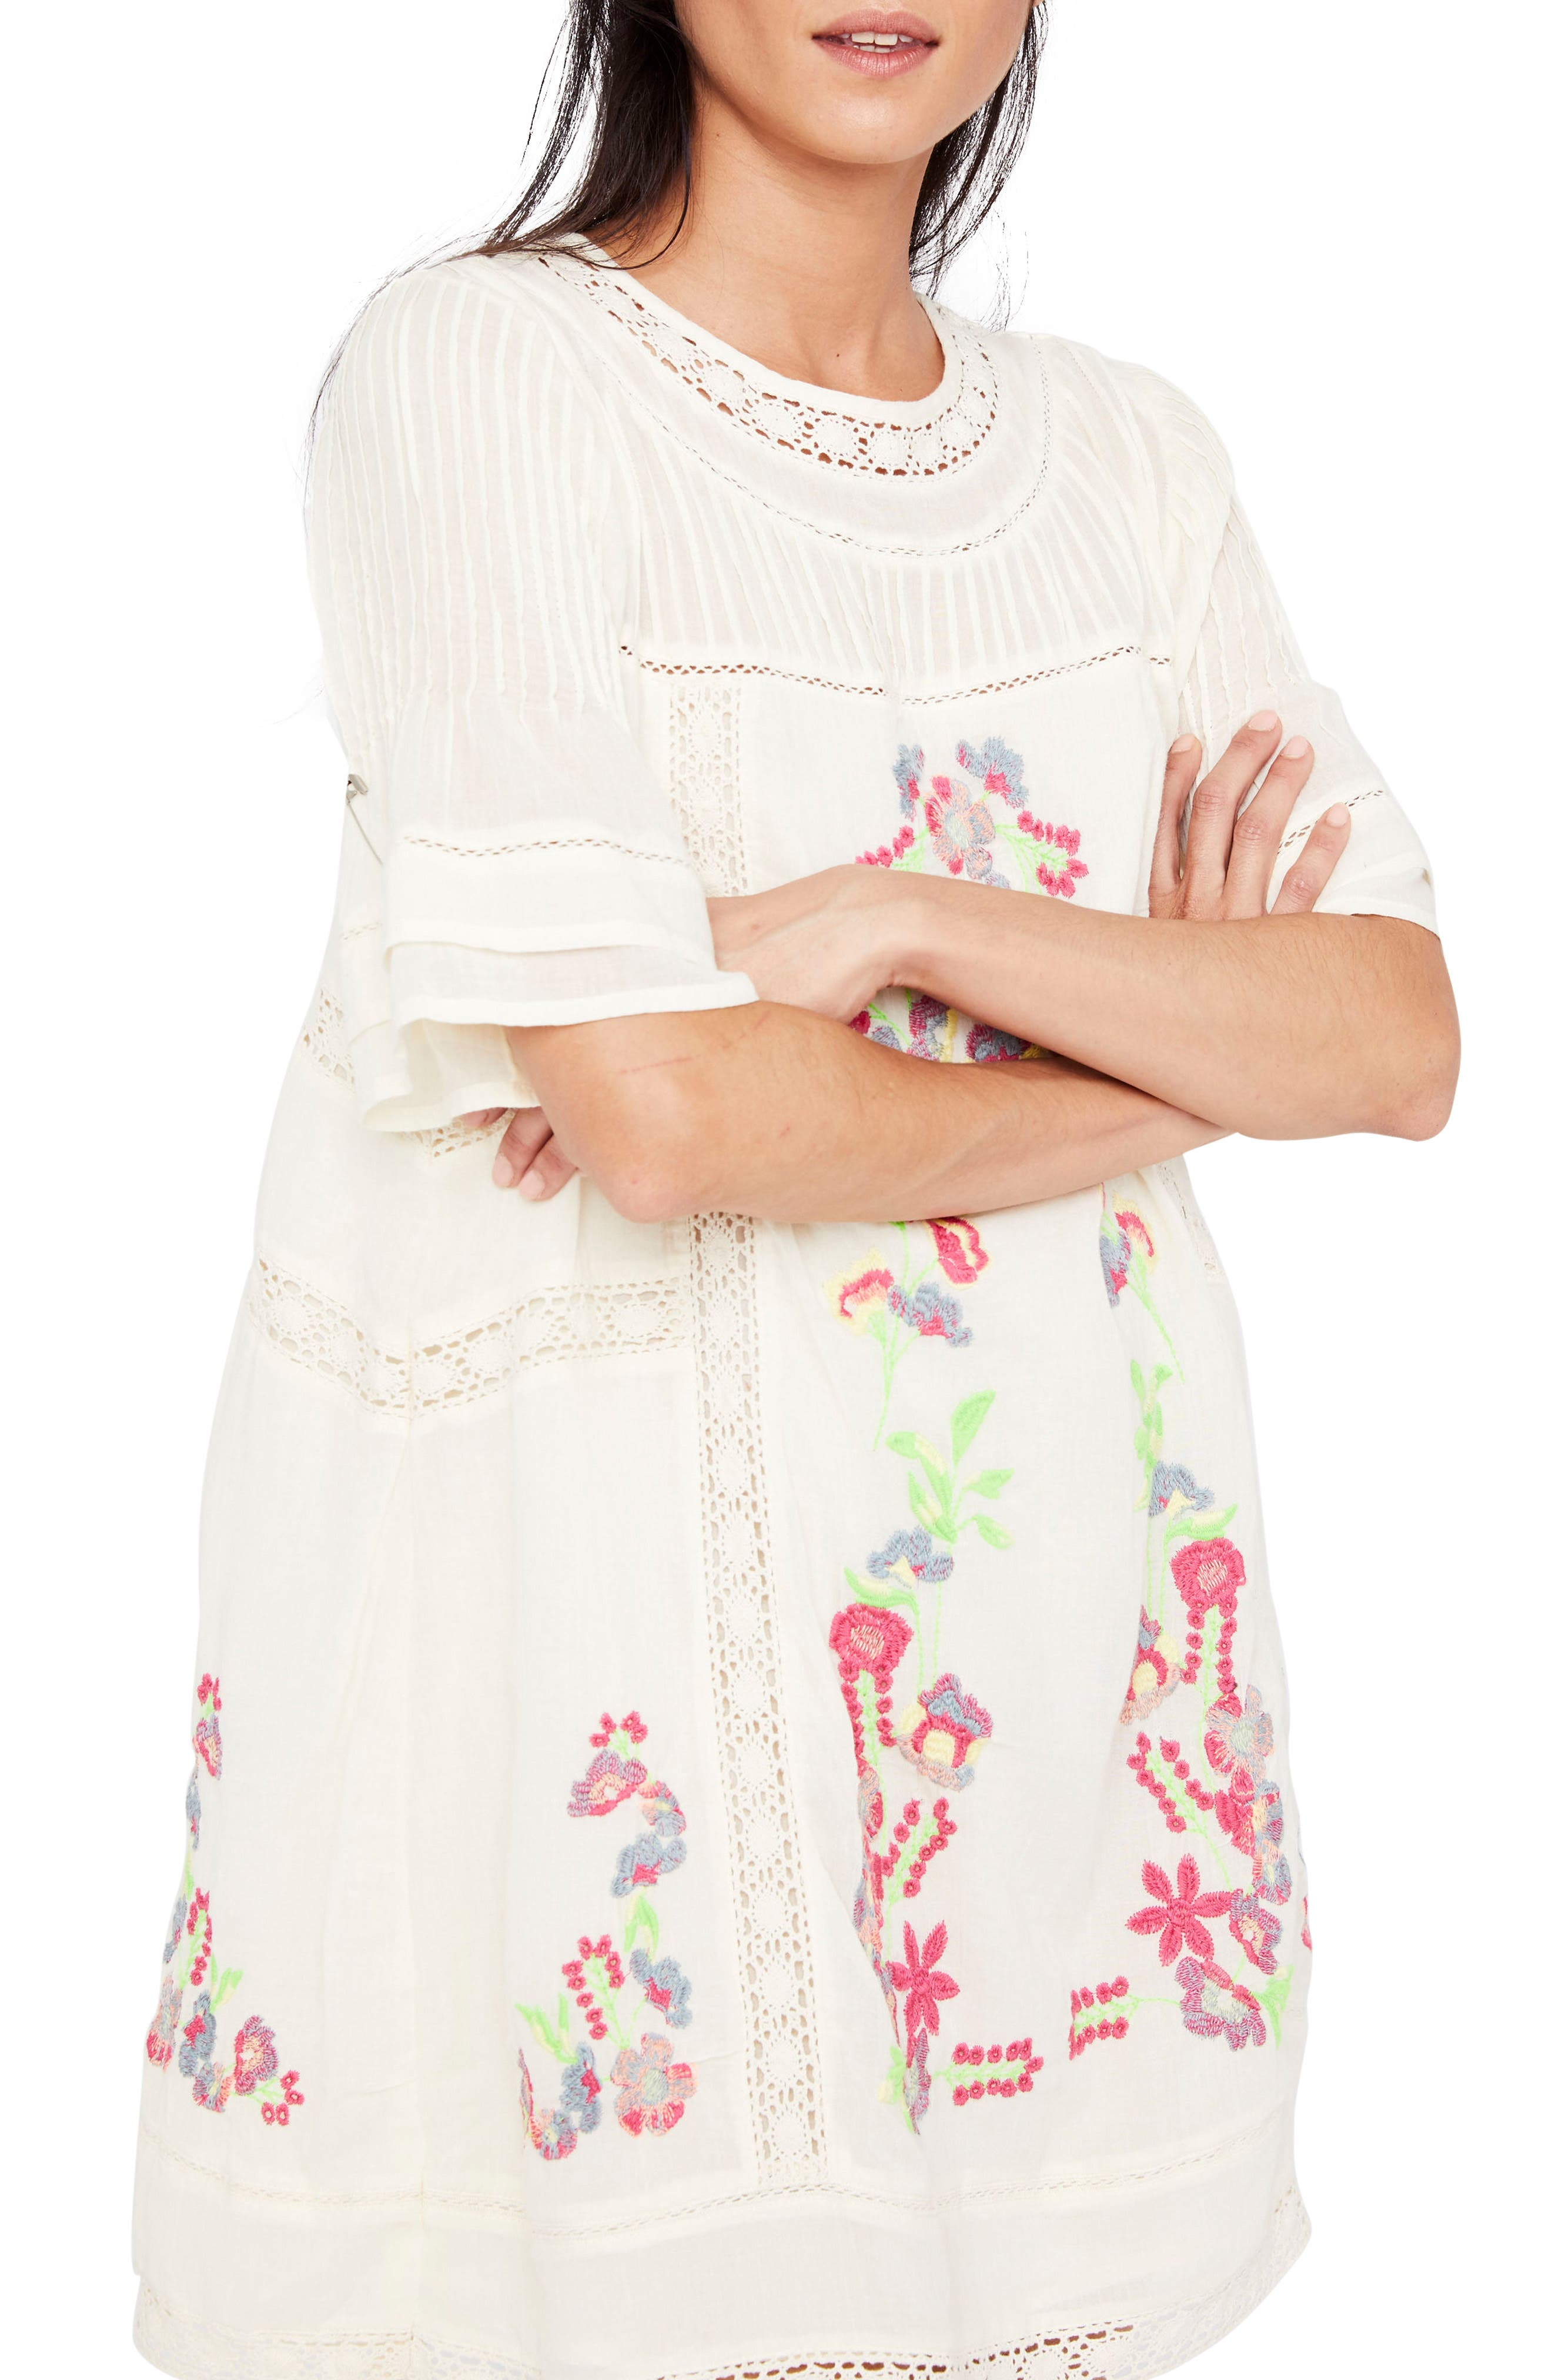 'Perfectly Victorian' Minidress,                             Main thumbnail 1, color,                             White